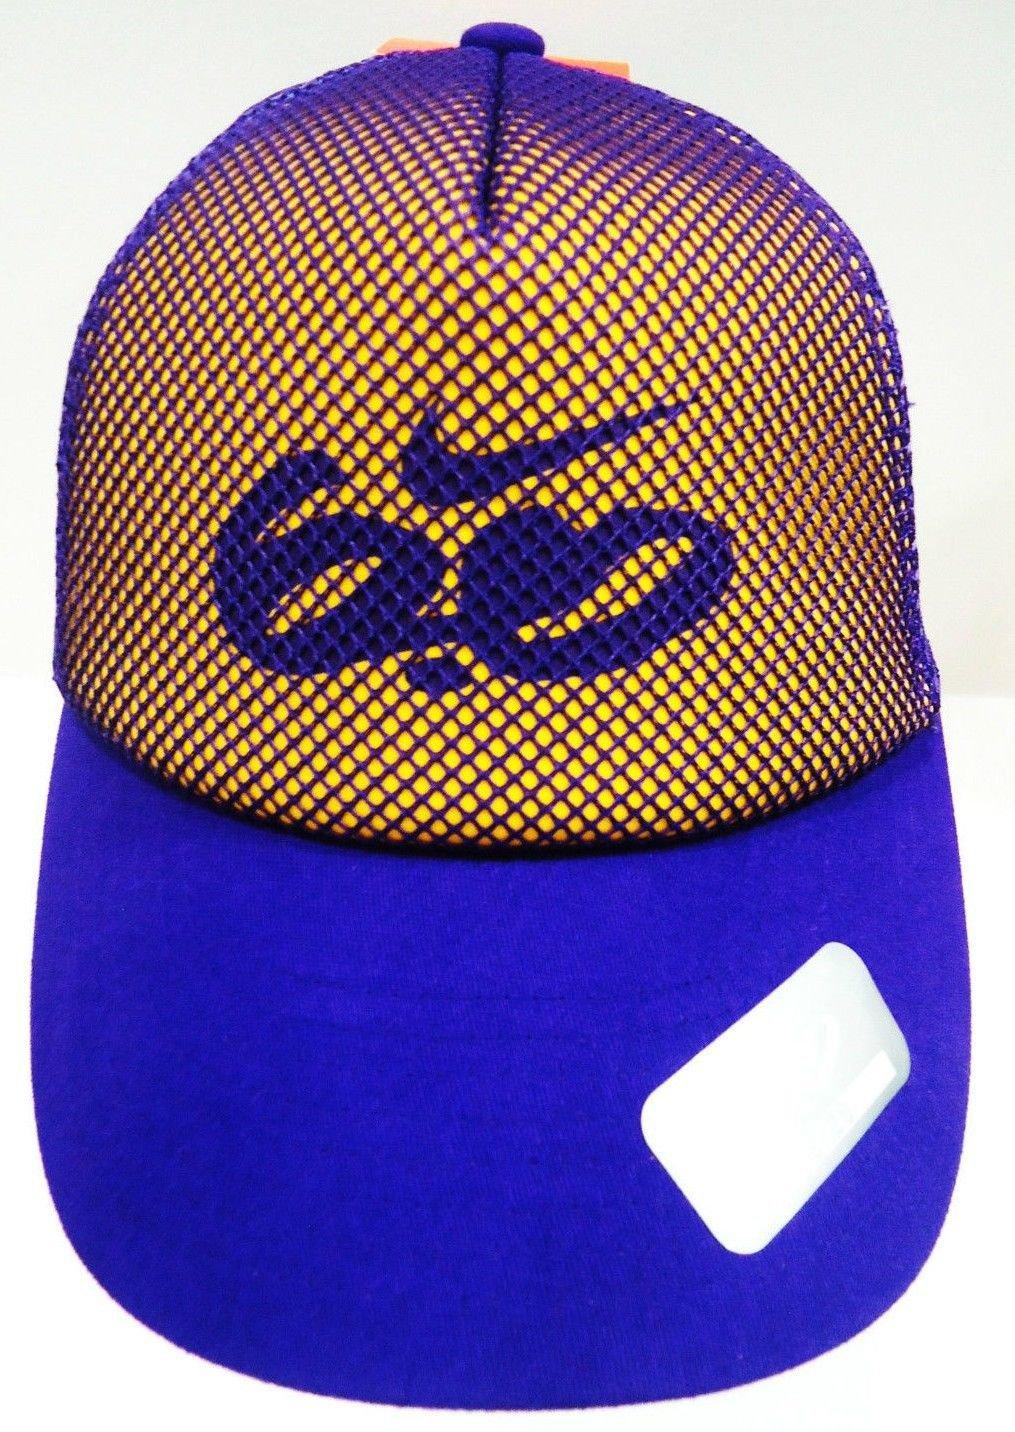 NIKE - 6.0 - FITTED - PURPLE - YELLOW - TRUCKER - CAP - LAKERS - KOBE - HAT